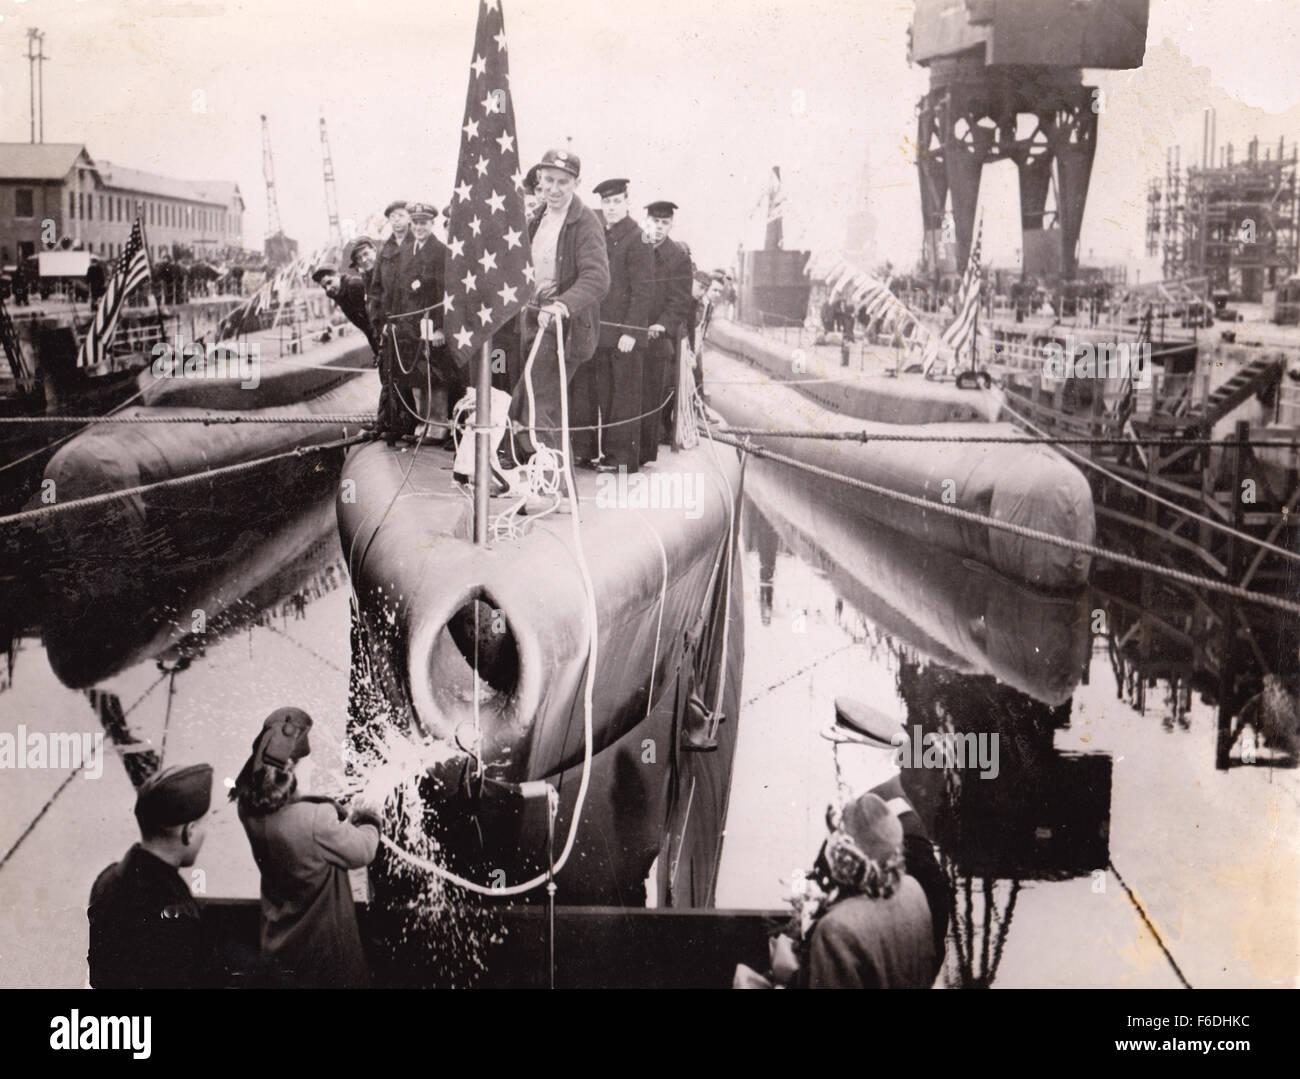 704 bringen uns u-Boot-Zeremonie. Stockfoto